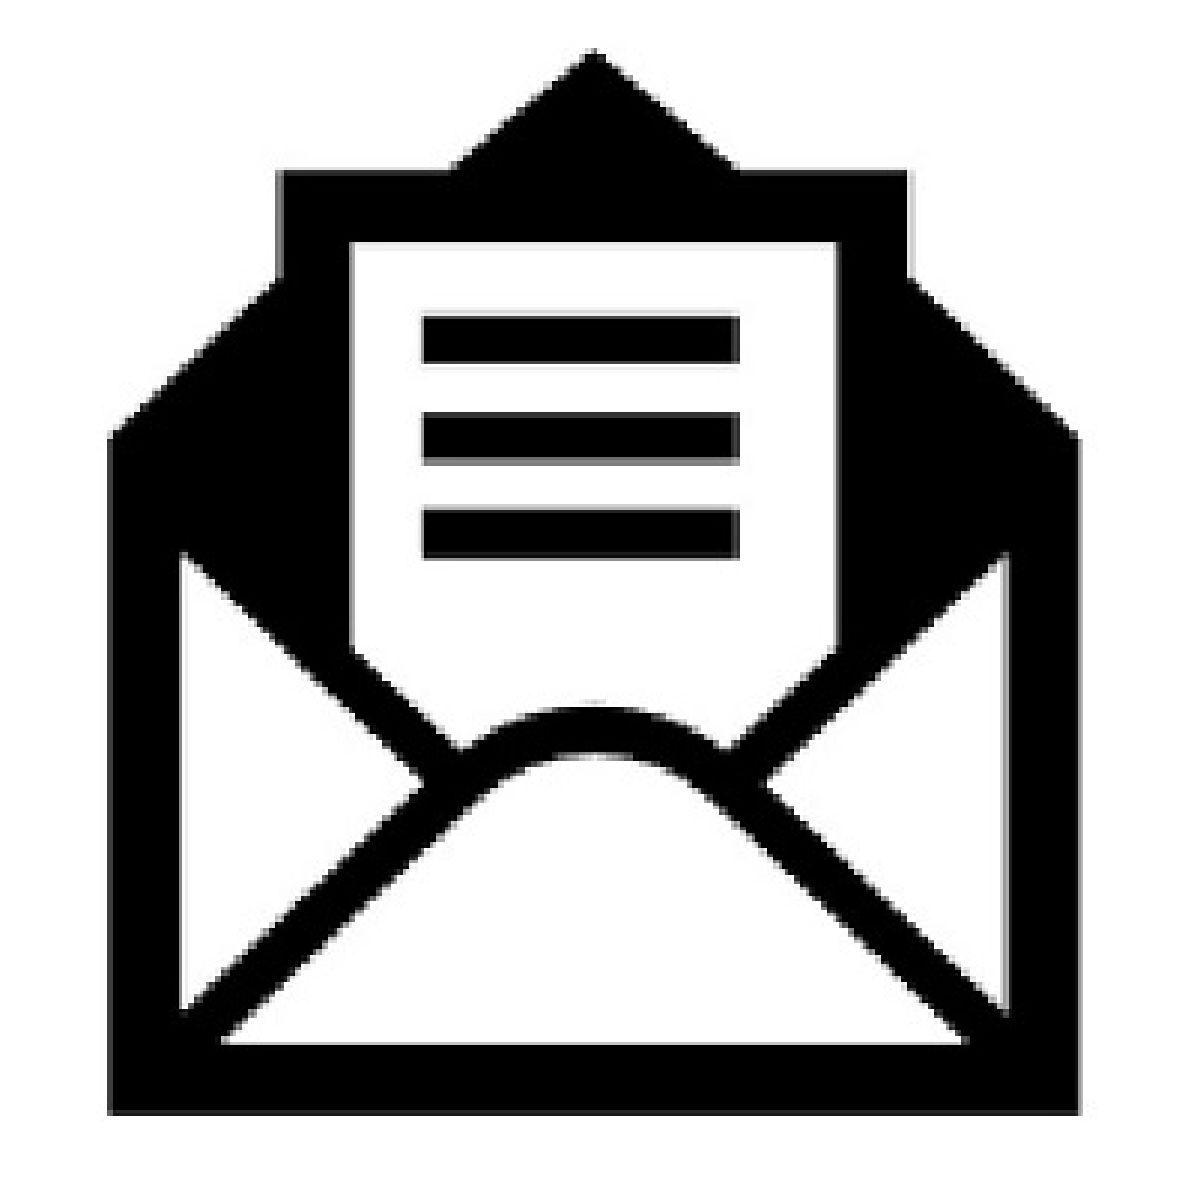 Newsletter Mäerz 2021